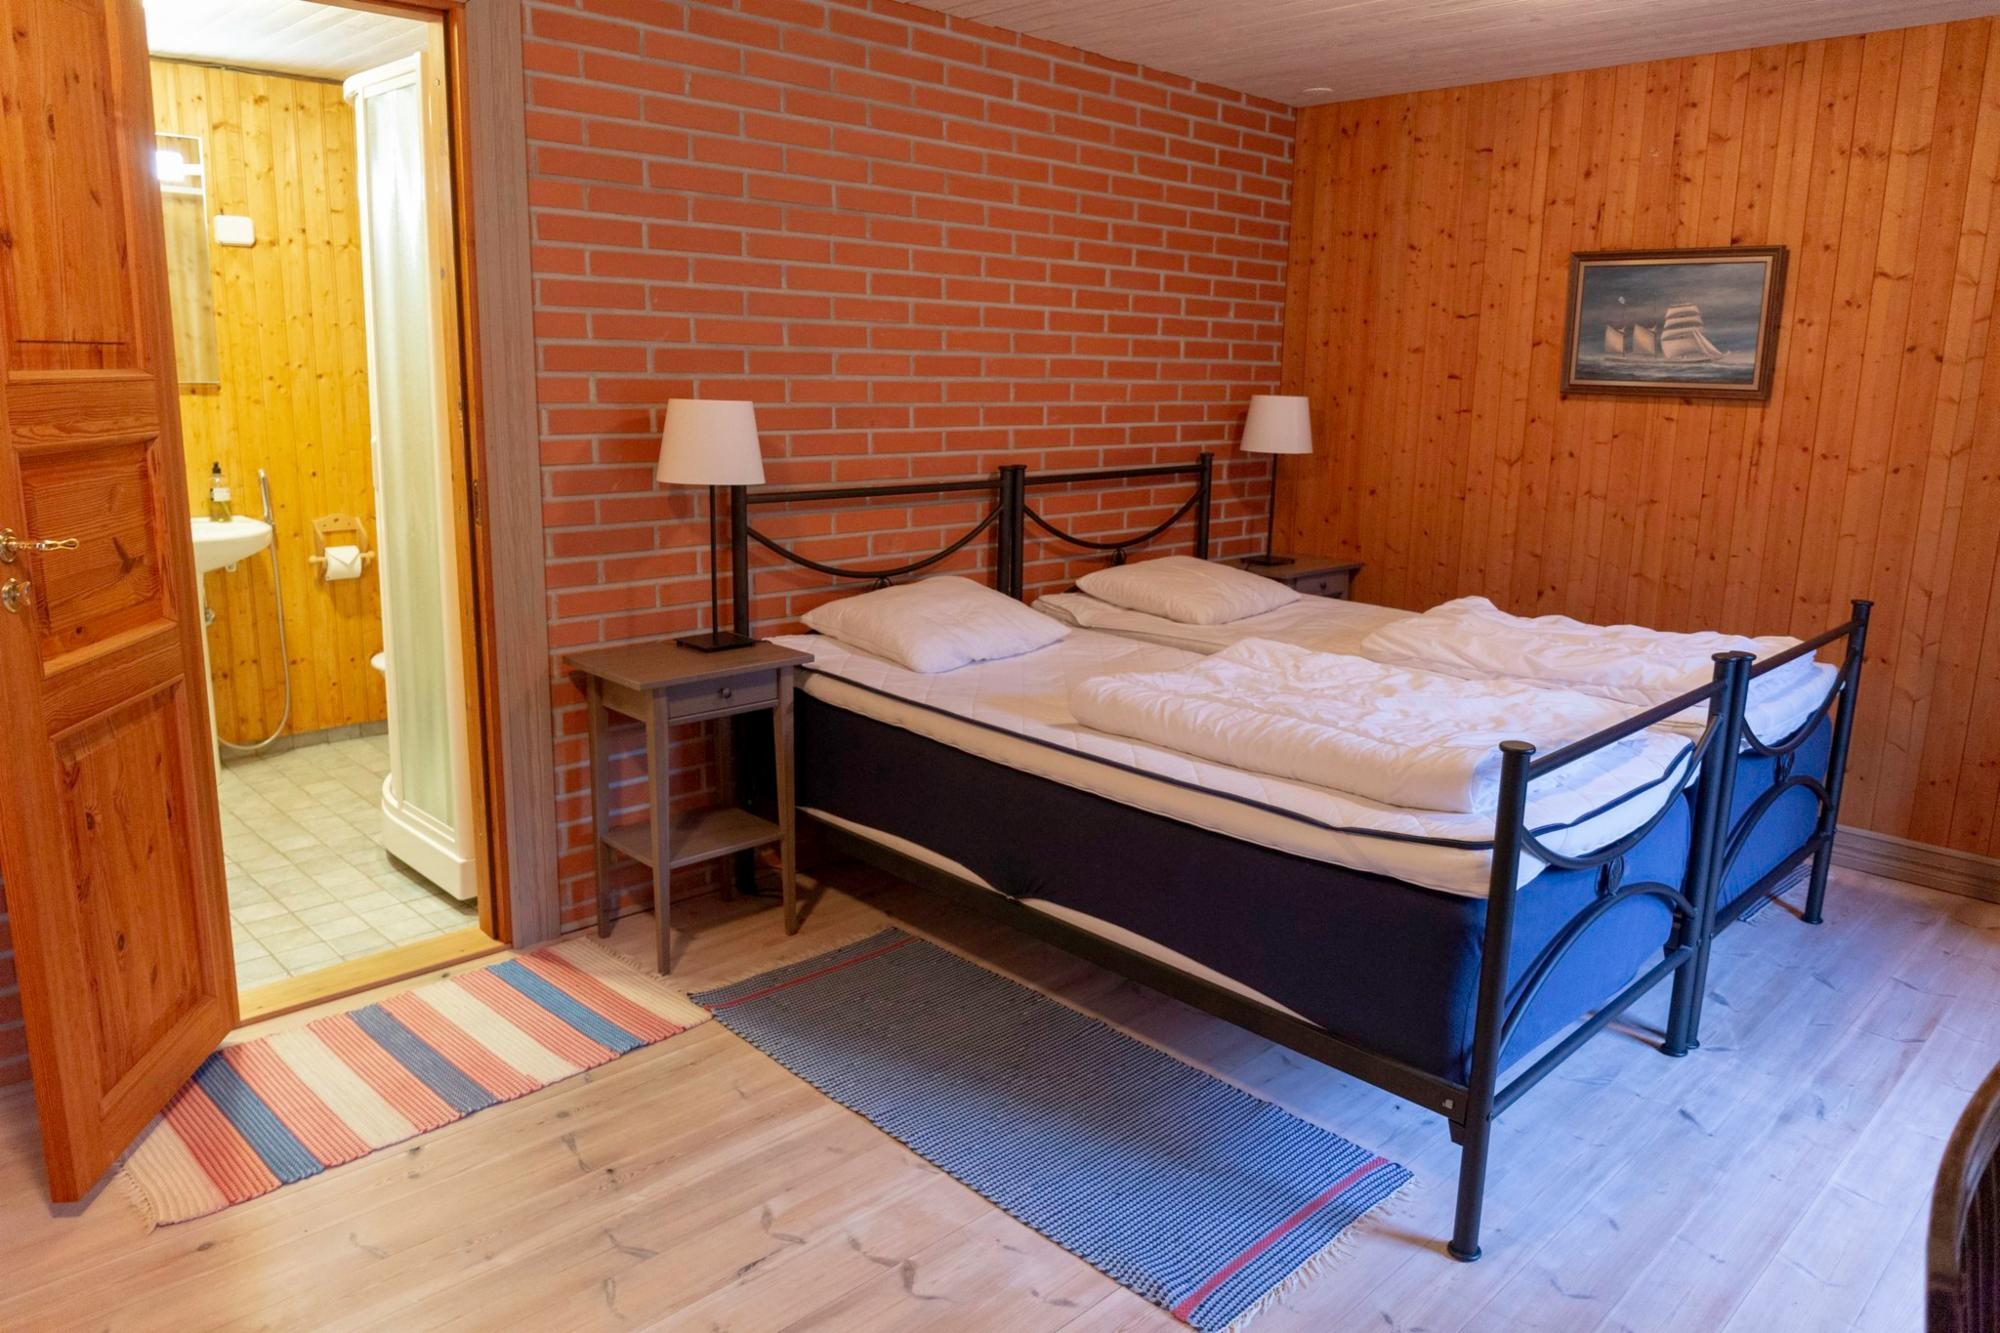 Västergård b&b 2 double room